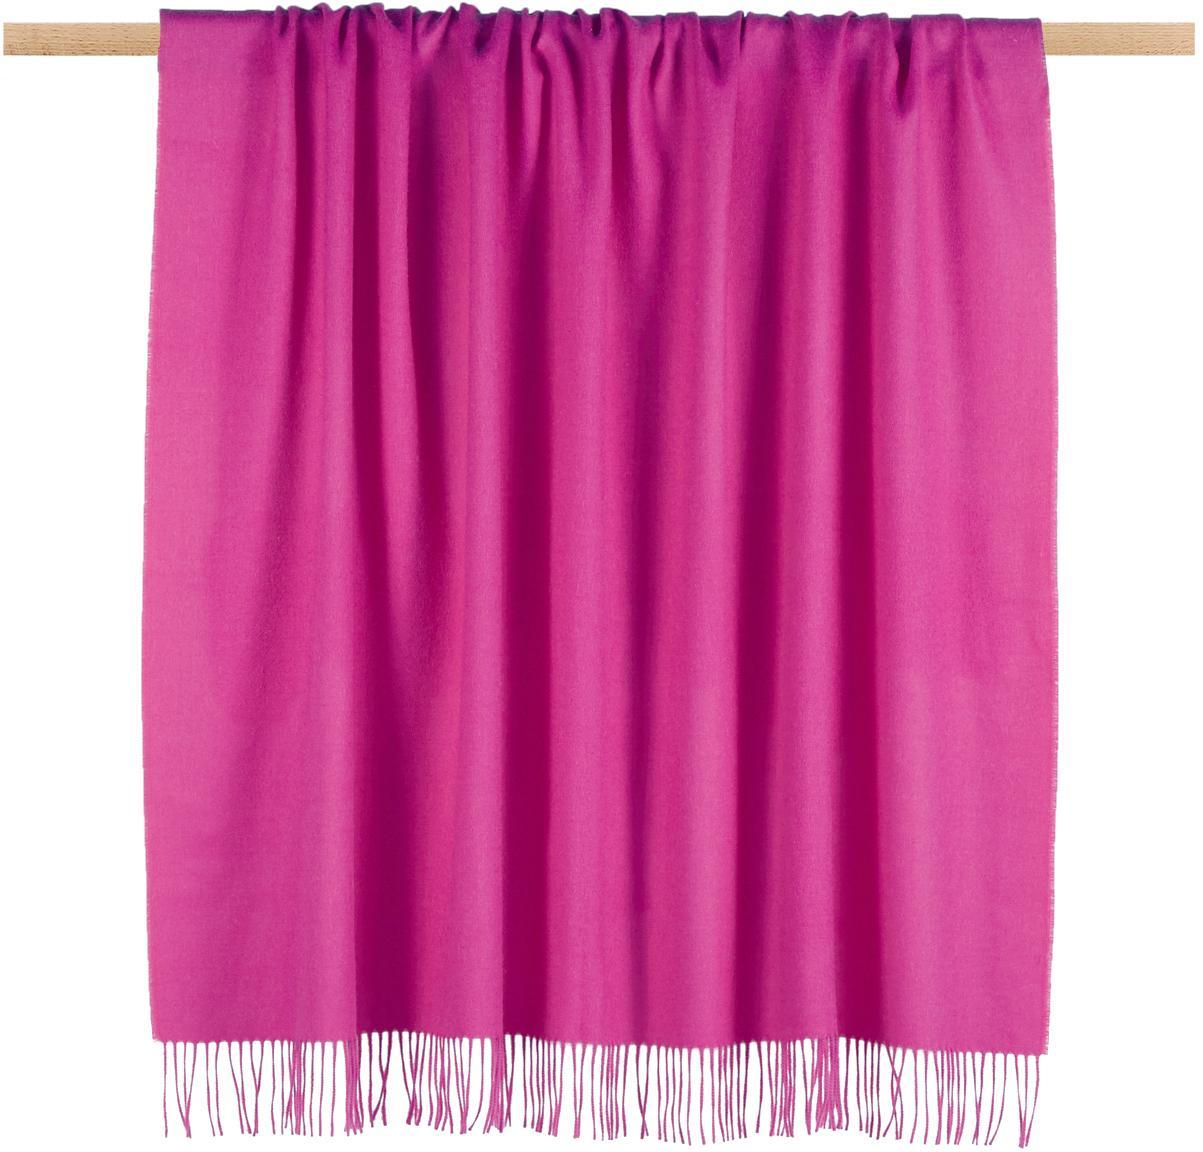 Babyalpaka-Plaid Luxury, Pink, 130 x 200 cm